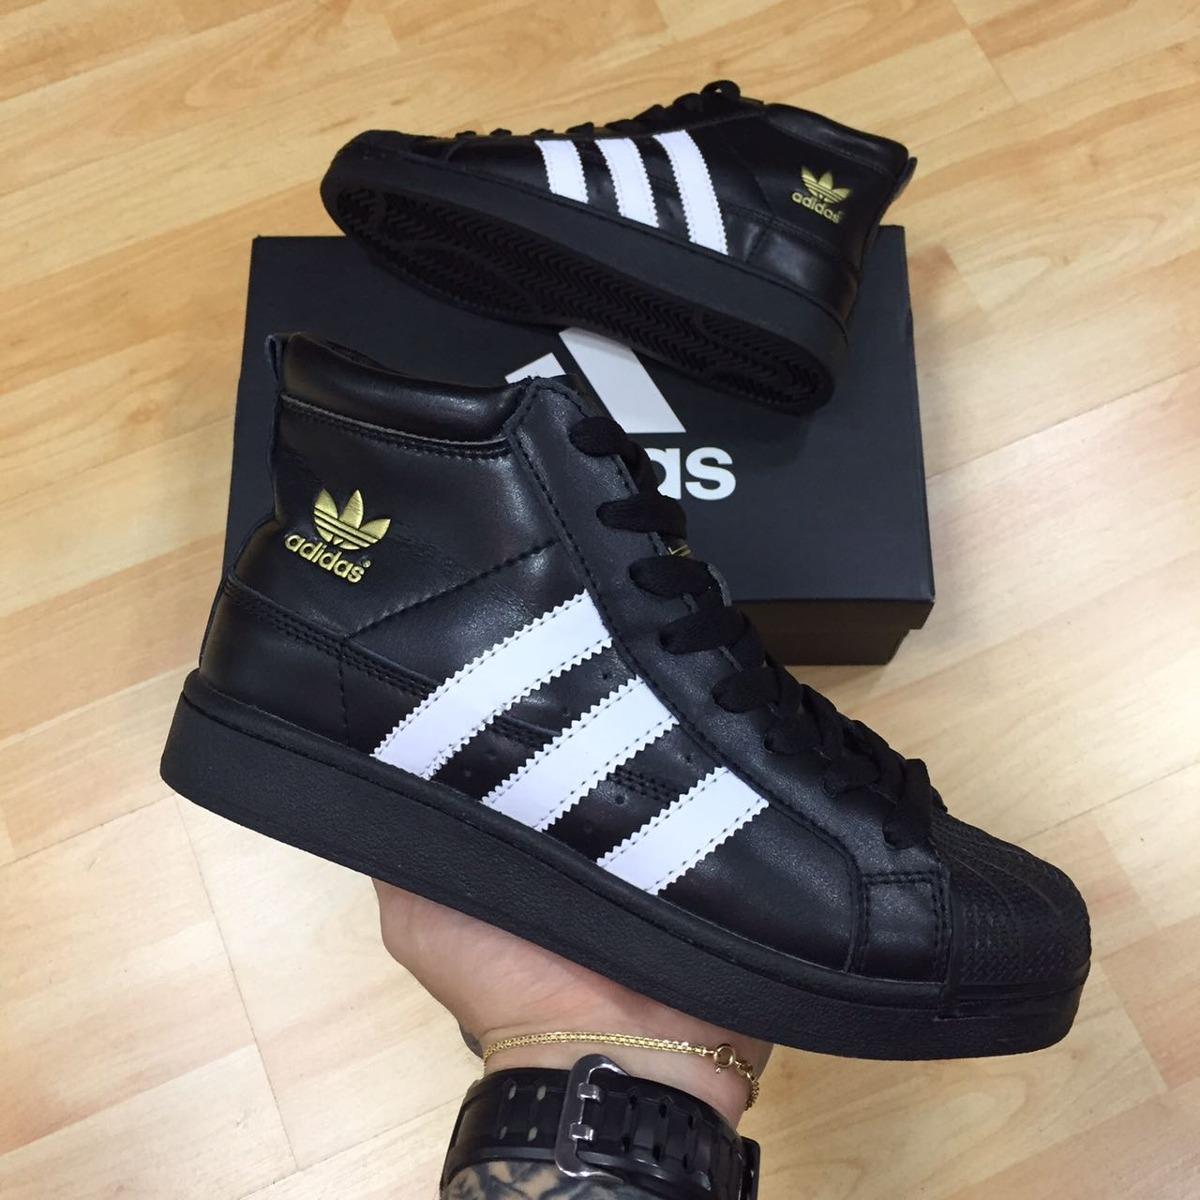 d71f04a6b adidas superstar bota negra. Cargando zoom.